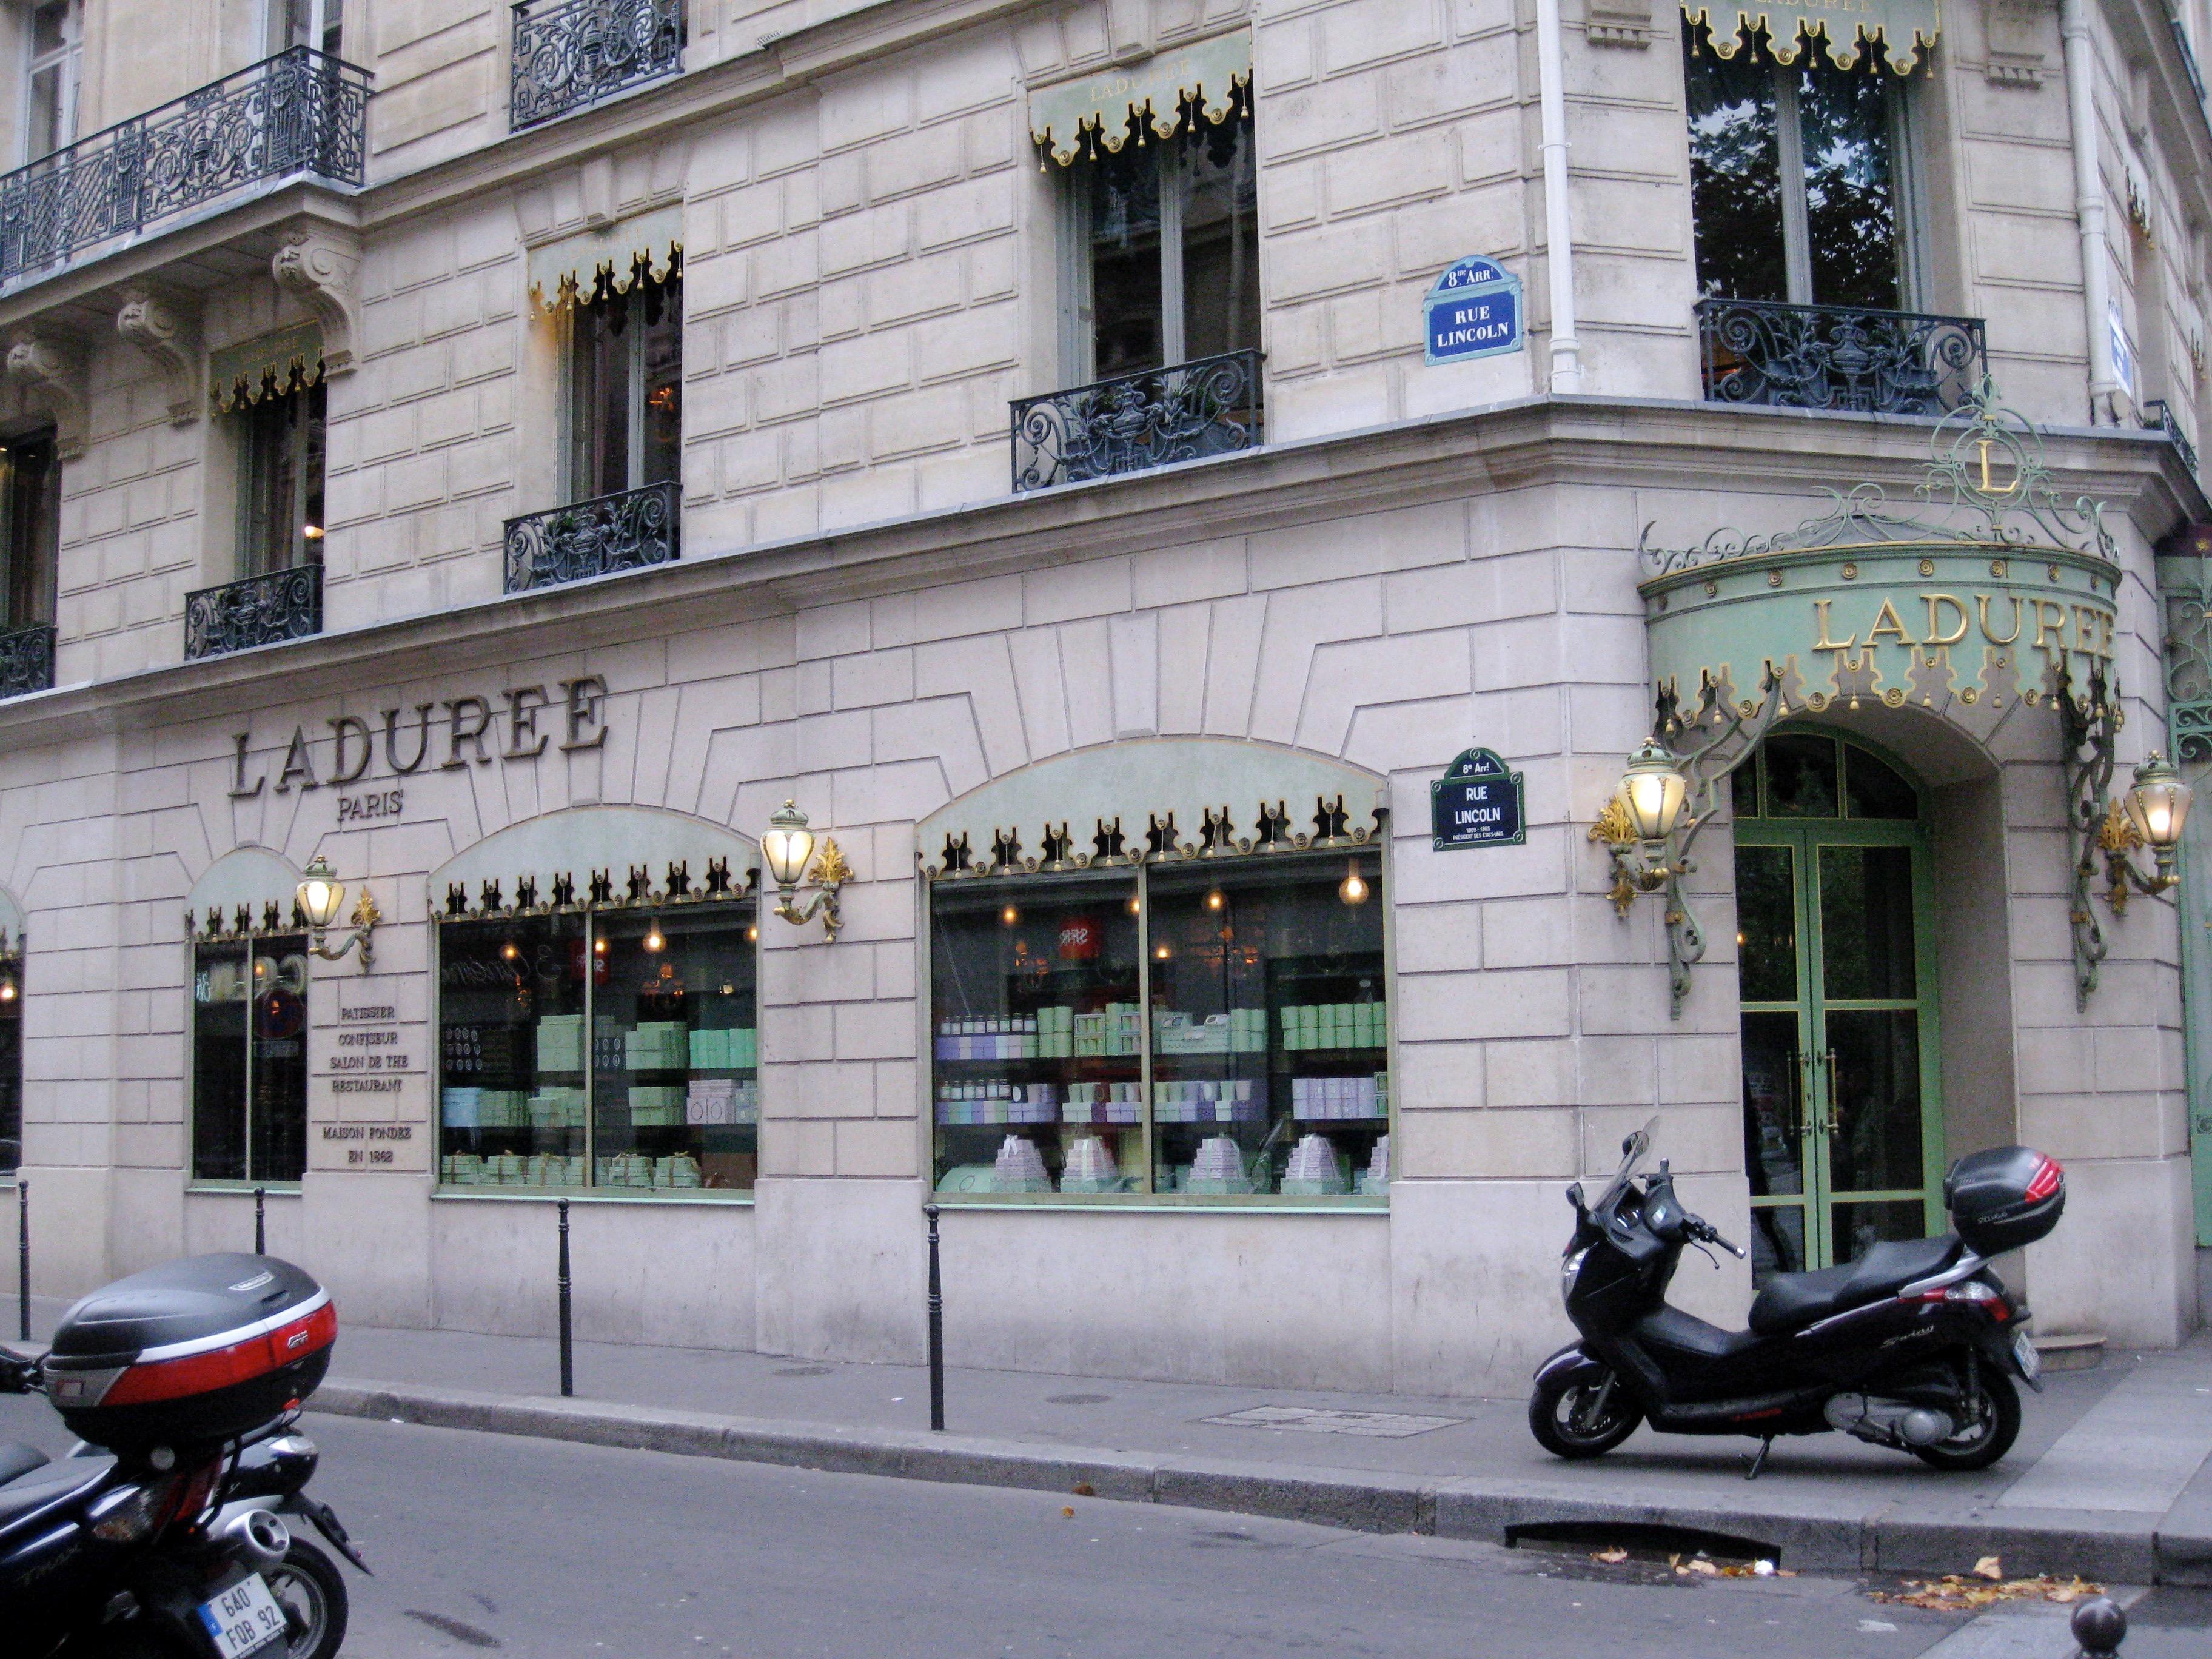 Paris Itinerary: Laduree on the Champs-Elysees